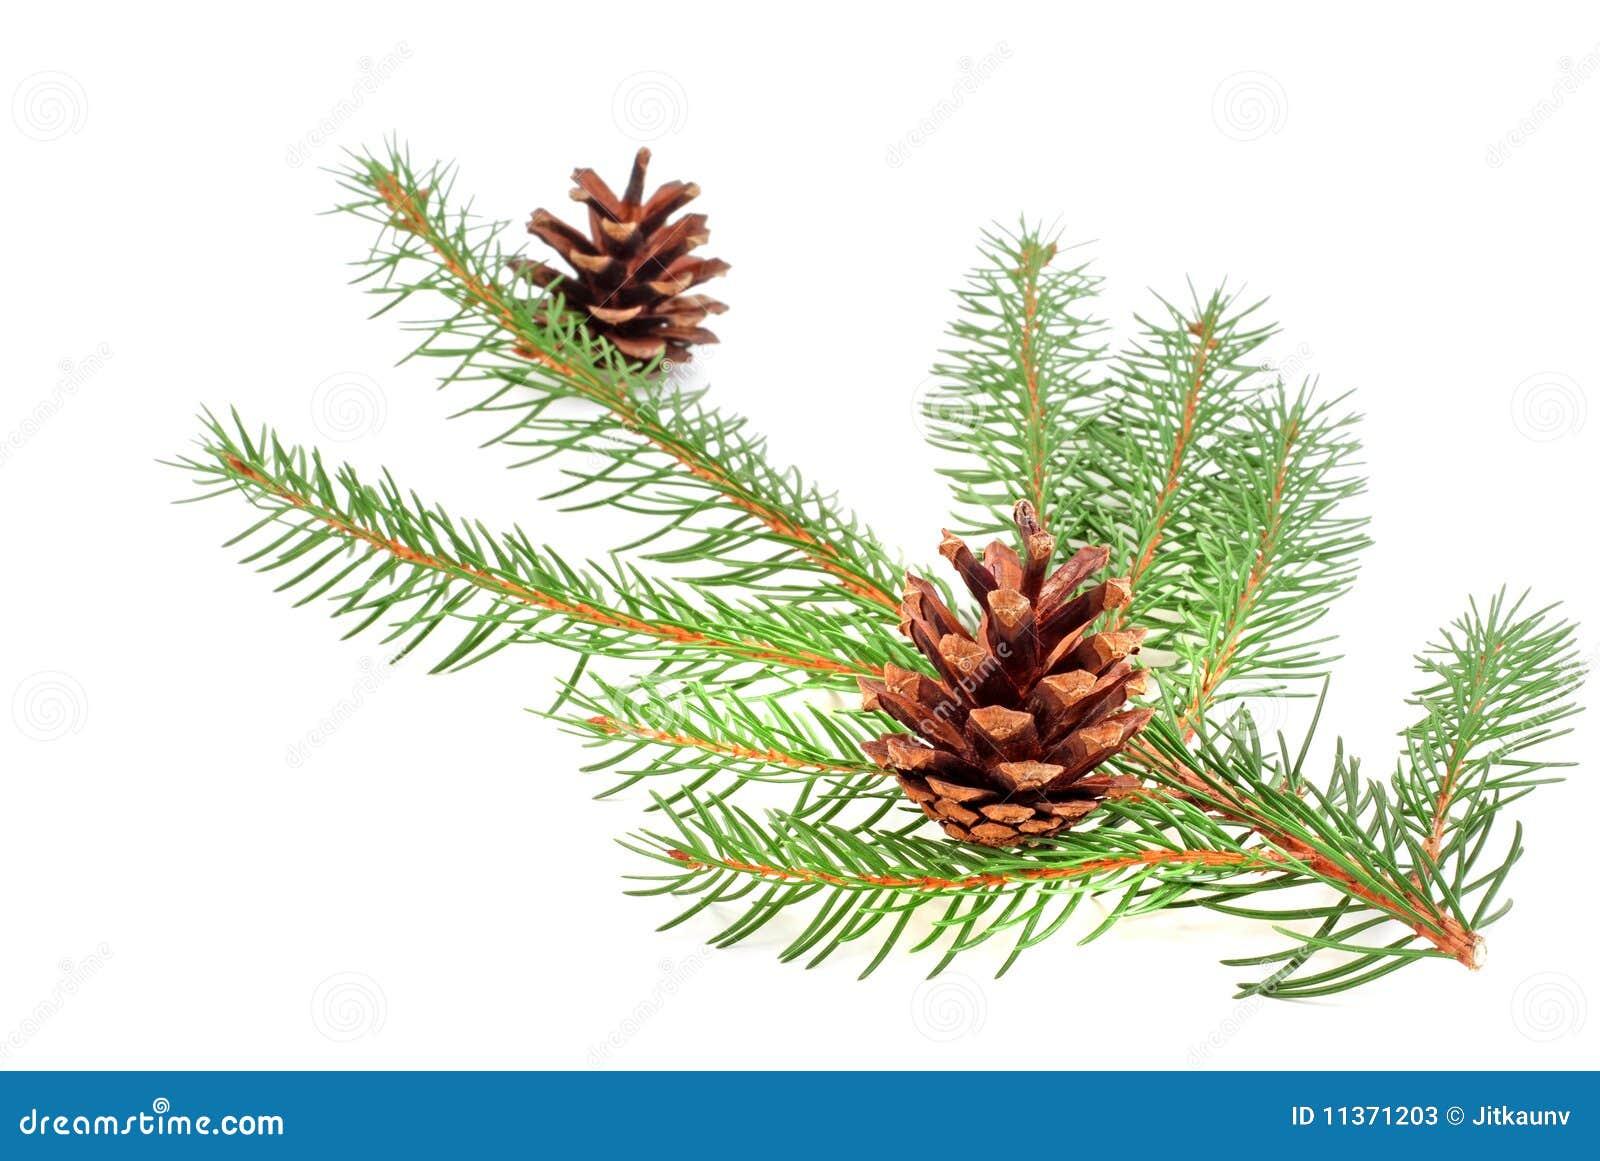 Christmas Tree Bough With Cone Stock Photos - Image: 11371203